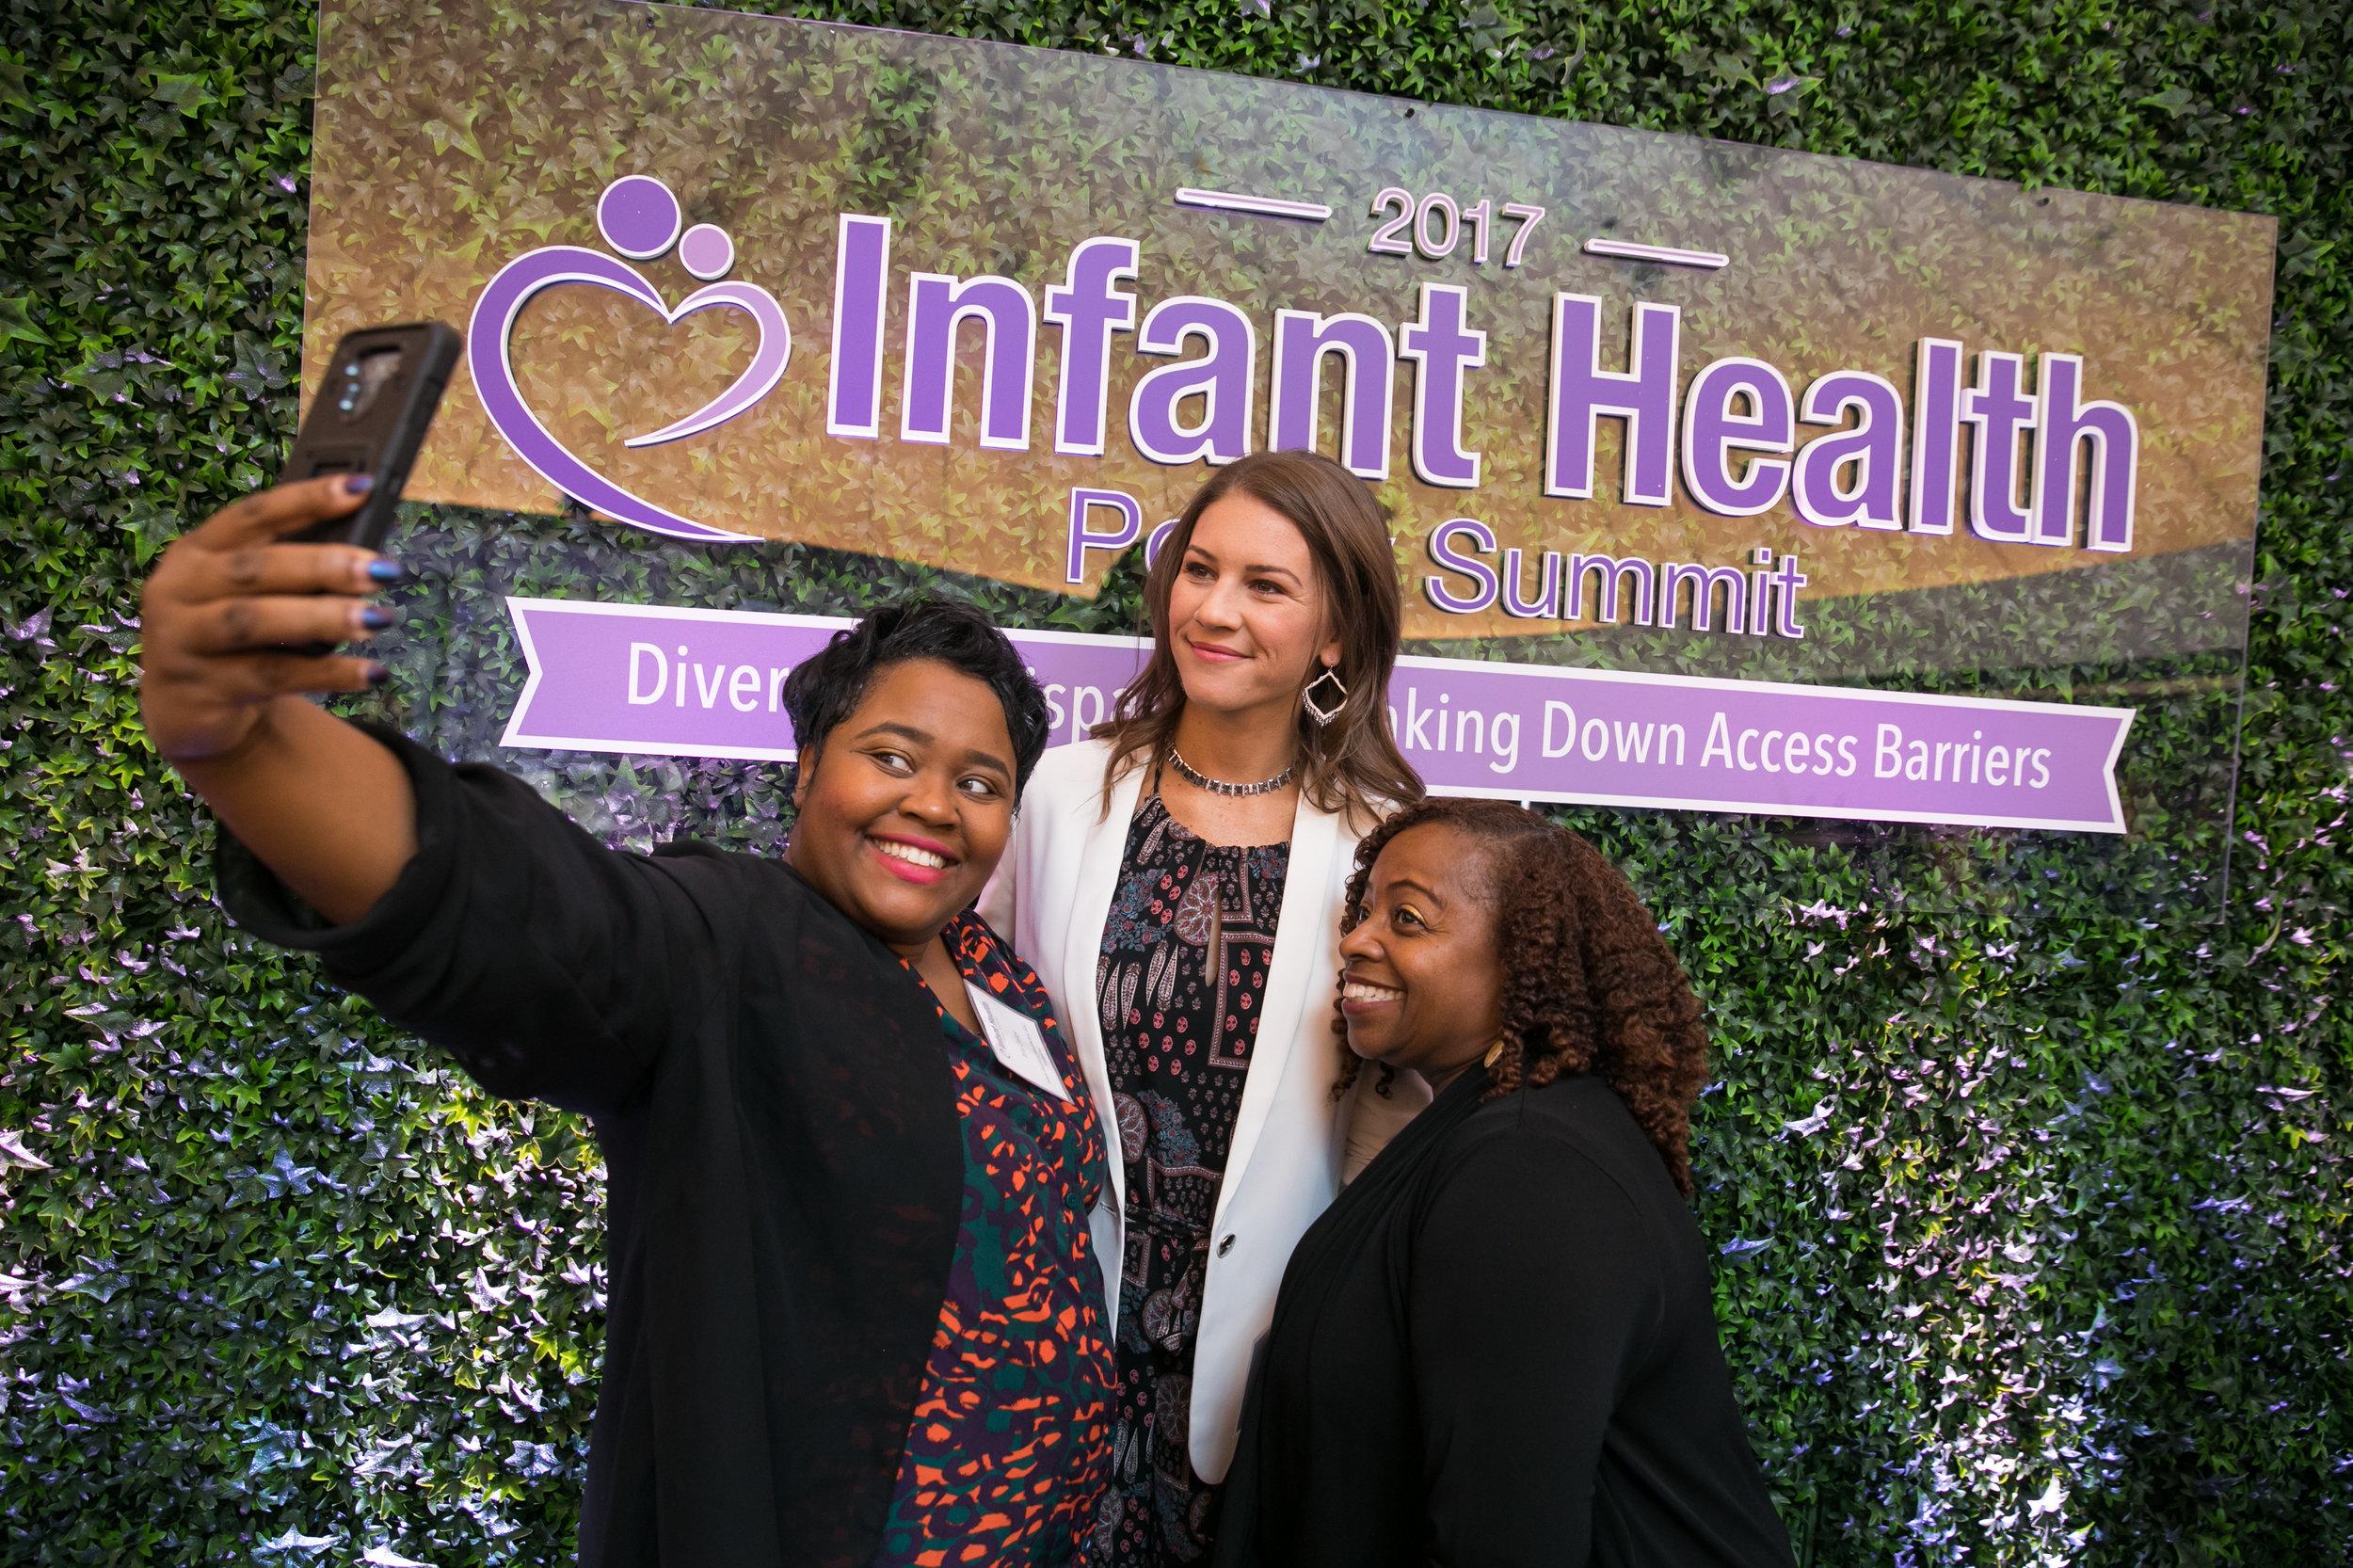 Infant Health Policy Summit - Jason Dixson Photography - 124122 - 0649.jpg